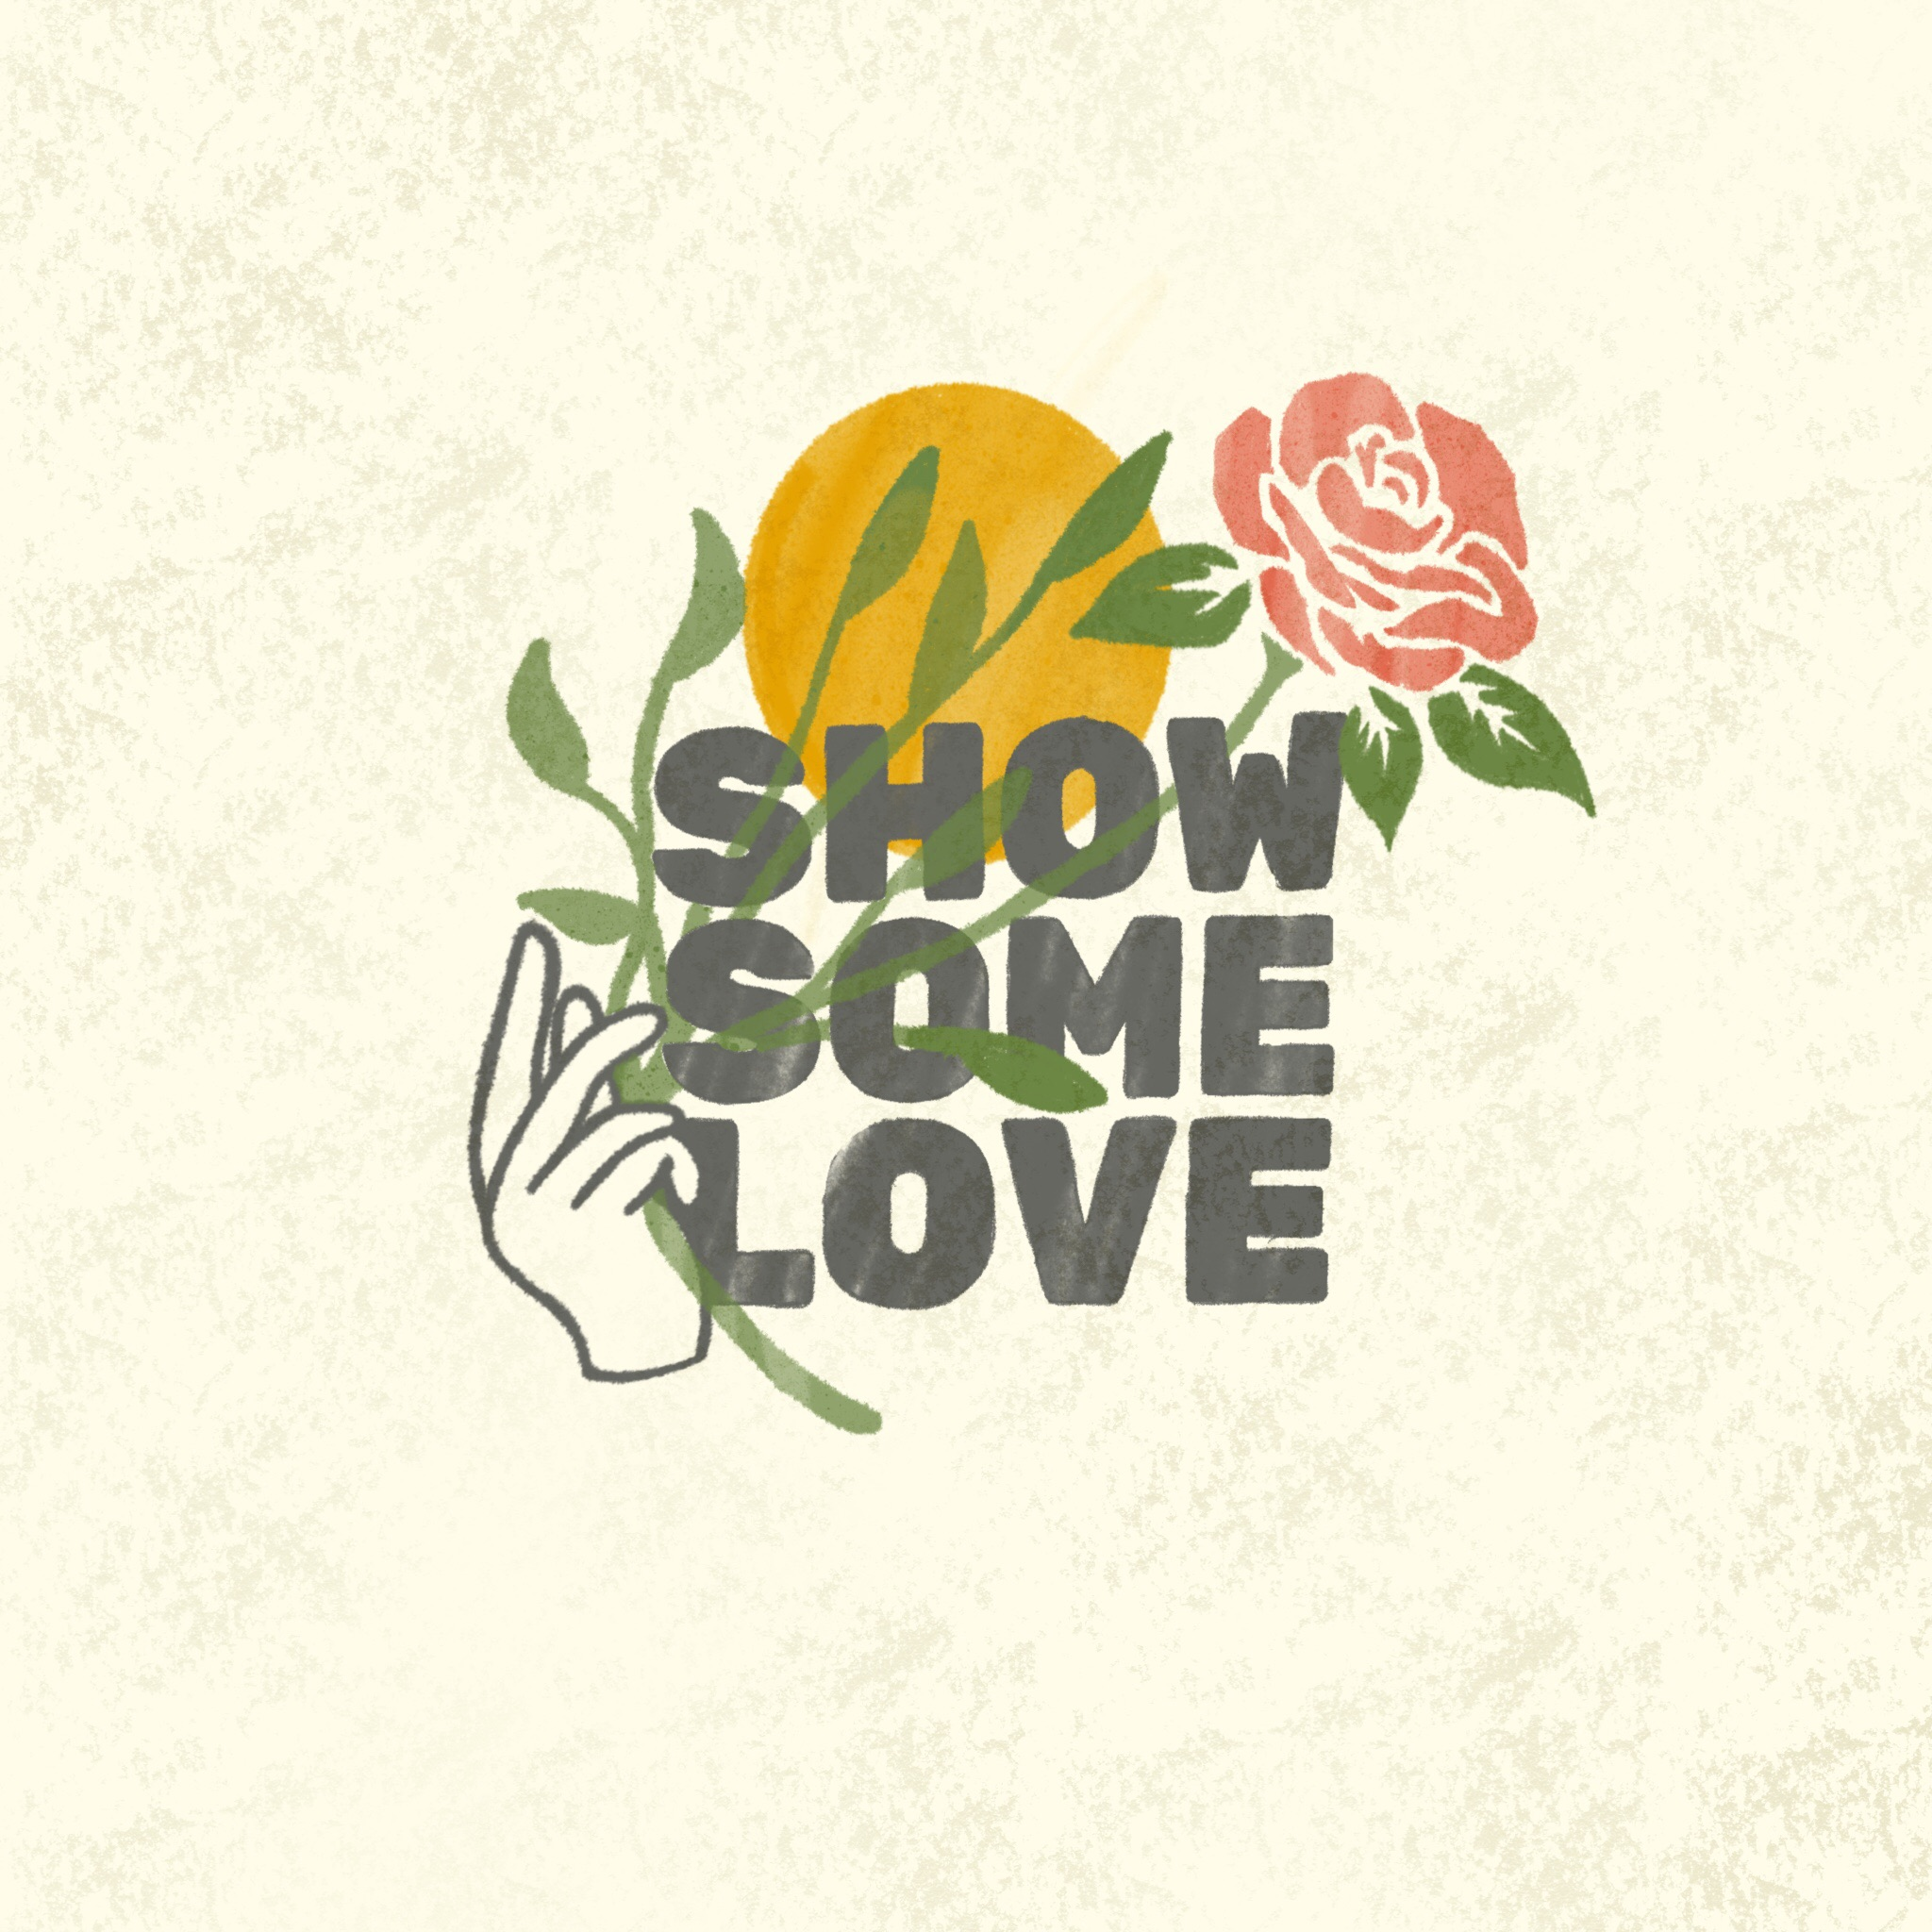 Show Some Love.JPG